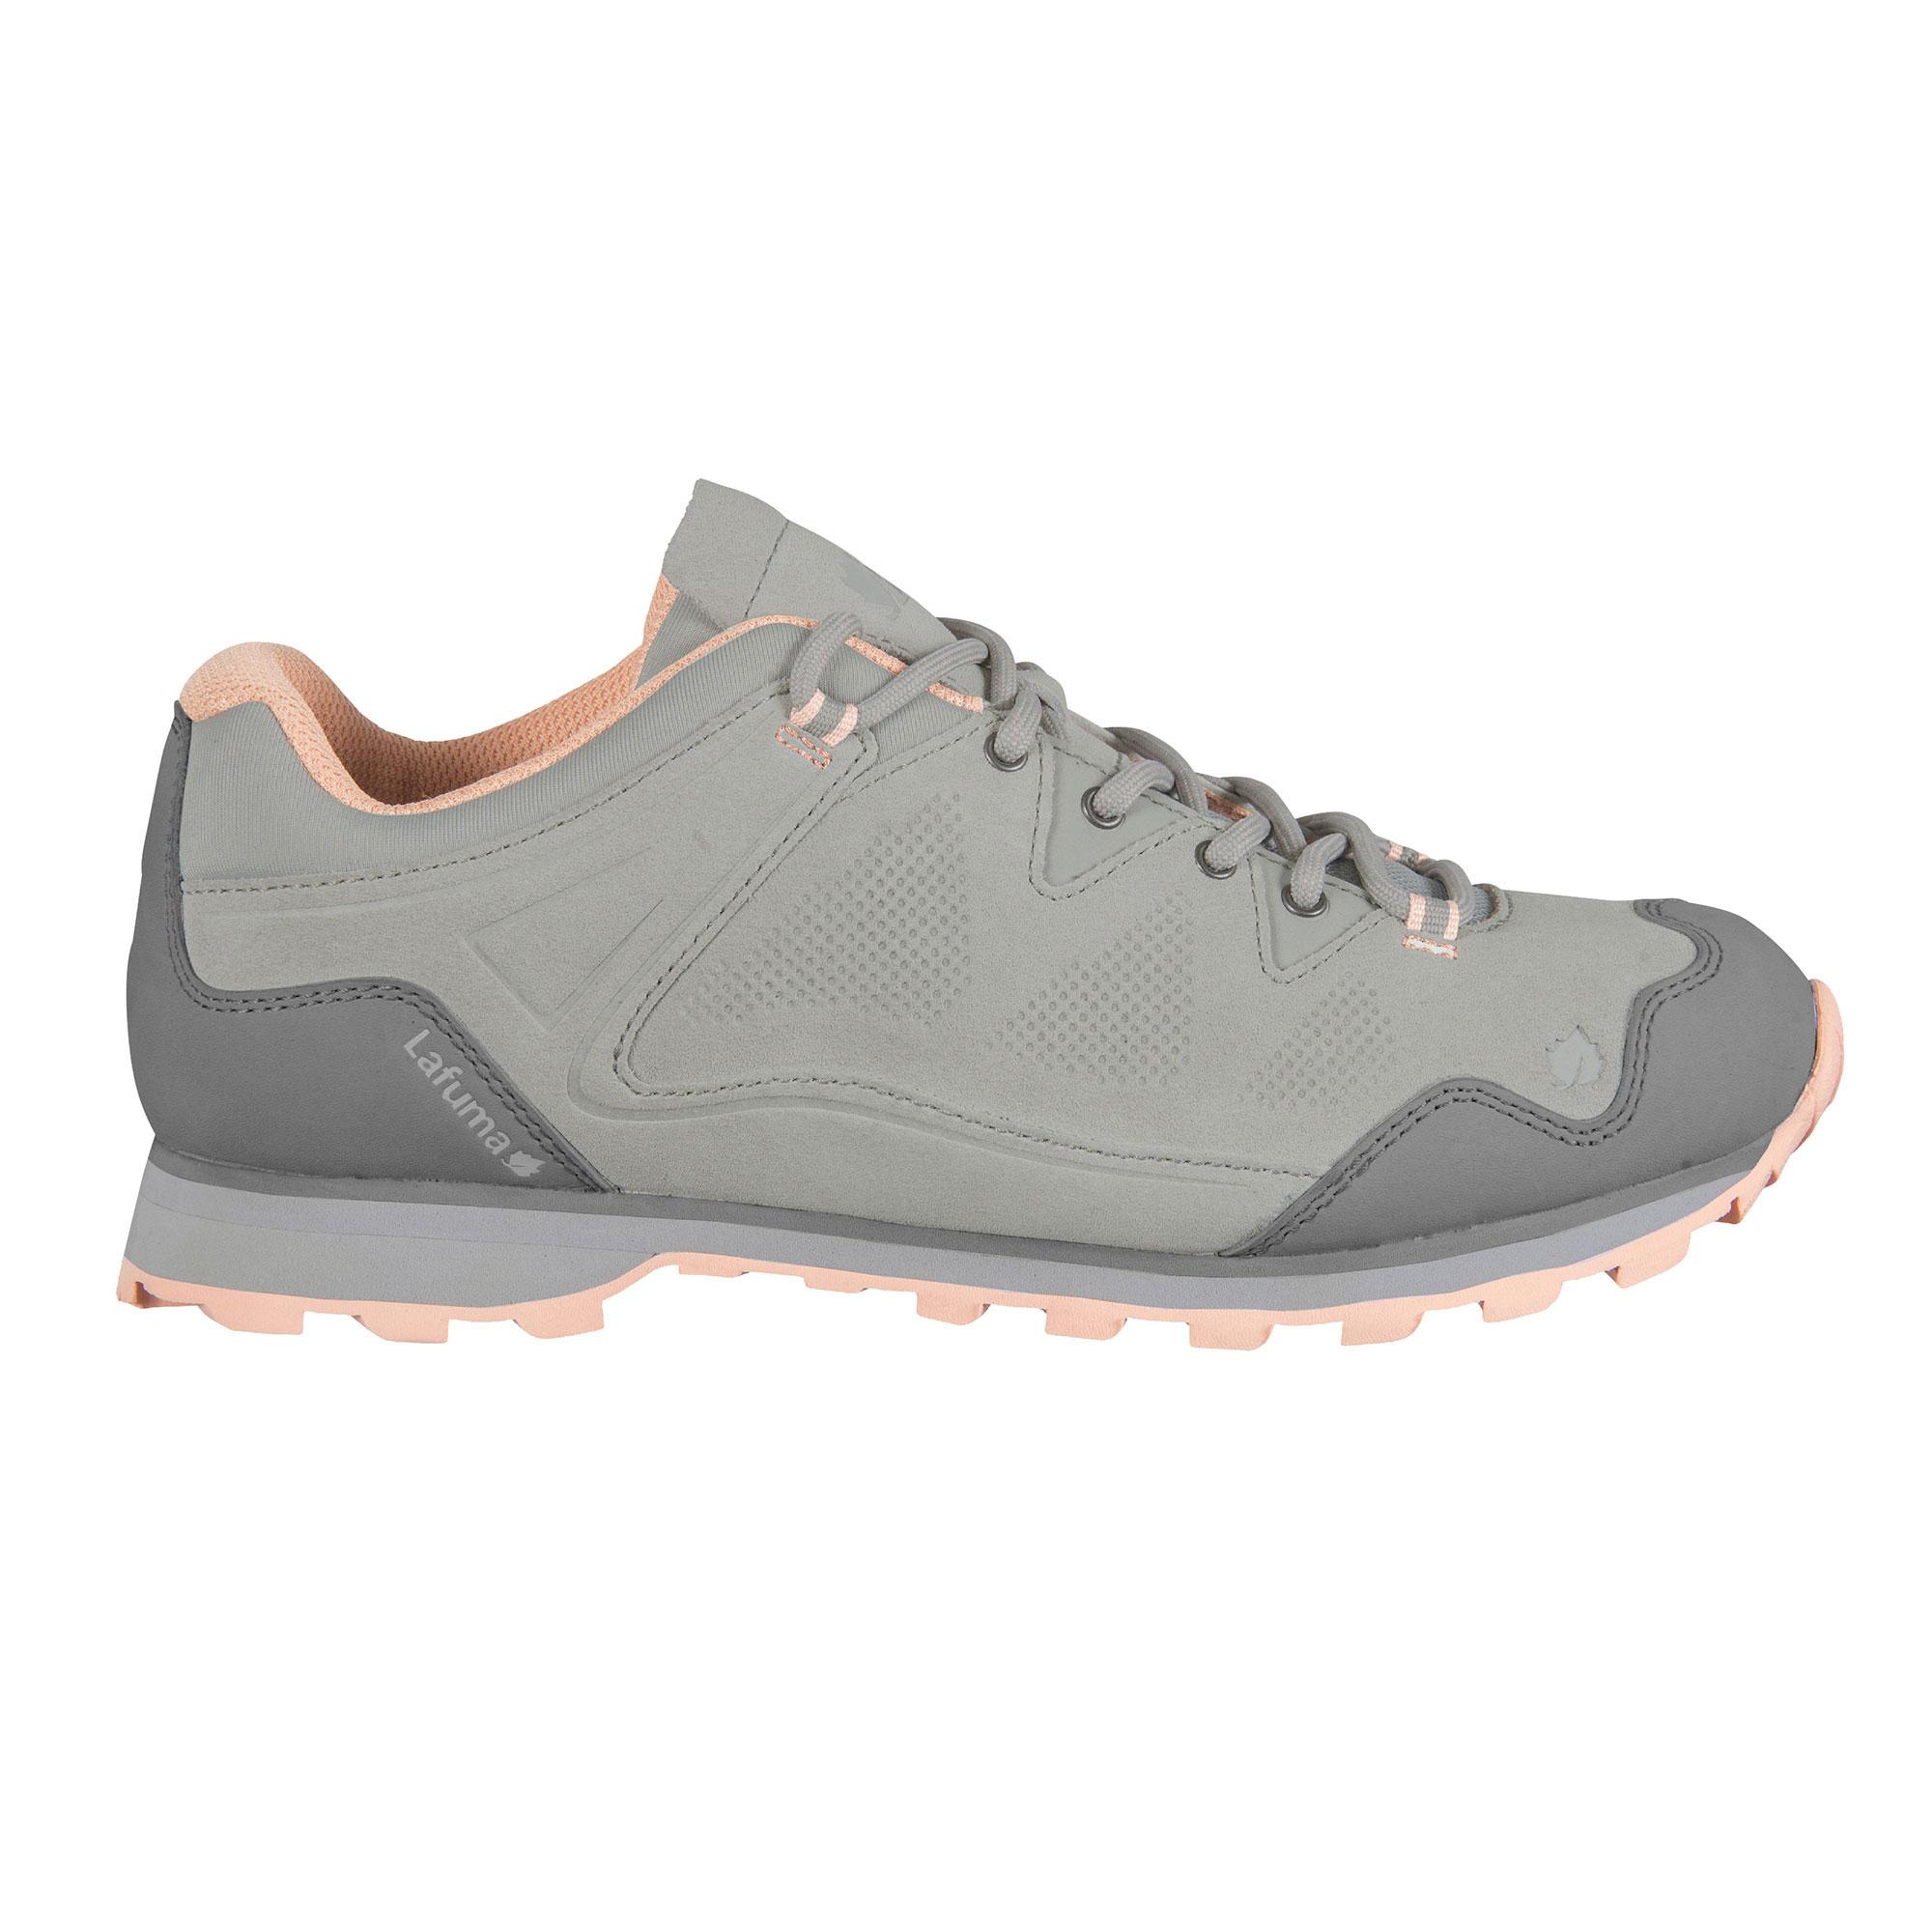 Lafuma Apennins W - Walking Boots - Women's